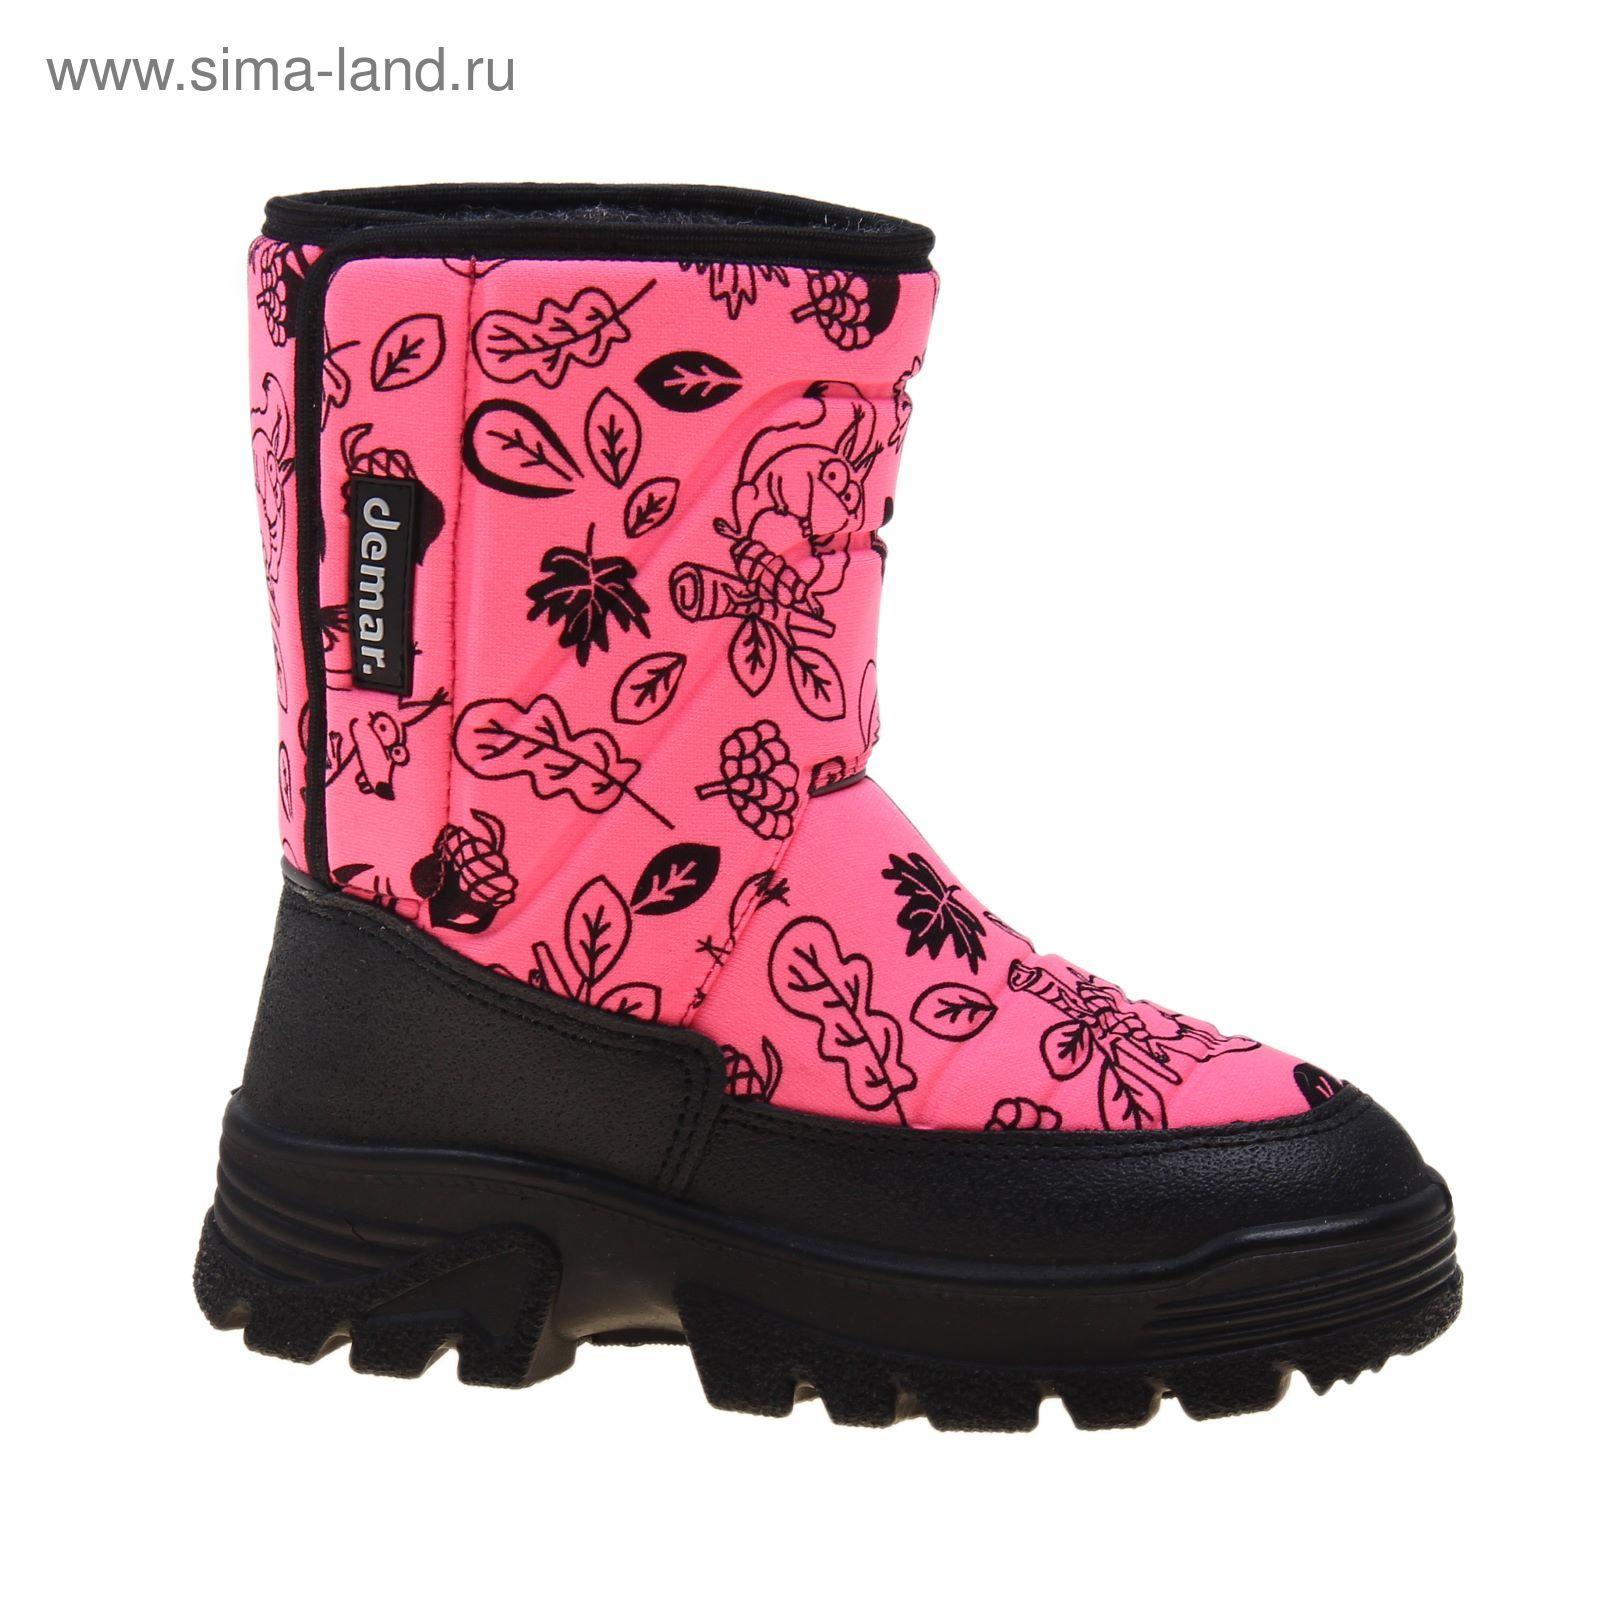 9b0f32f7f Сапоги Demar Hannu, размер 25, цвет розовый (арт.1601 G) (1508857 ...